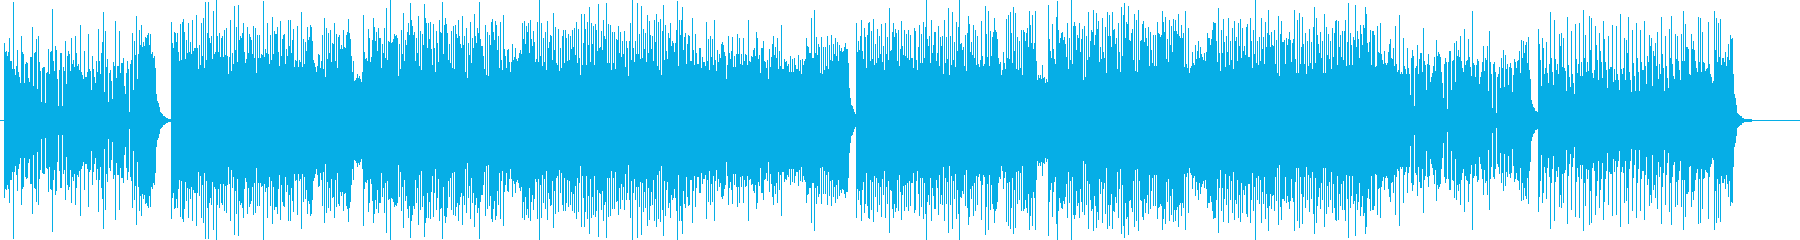 DARK・HARDROCK 勢い 287の再生済みの波形